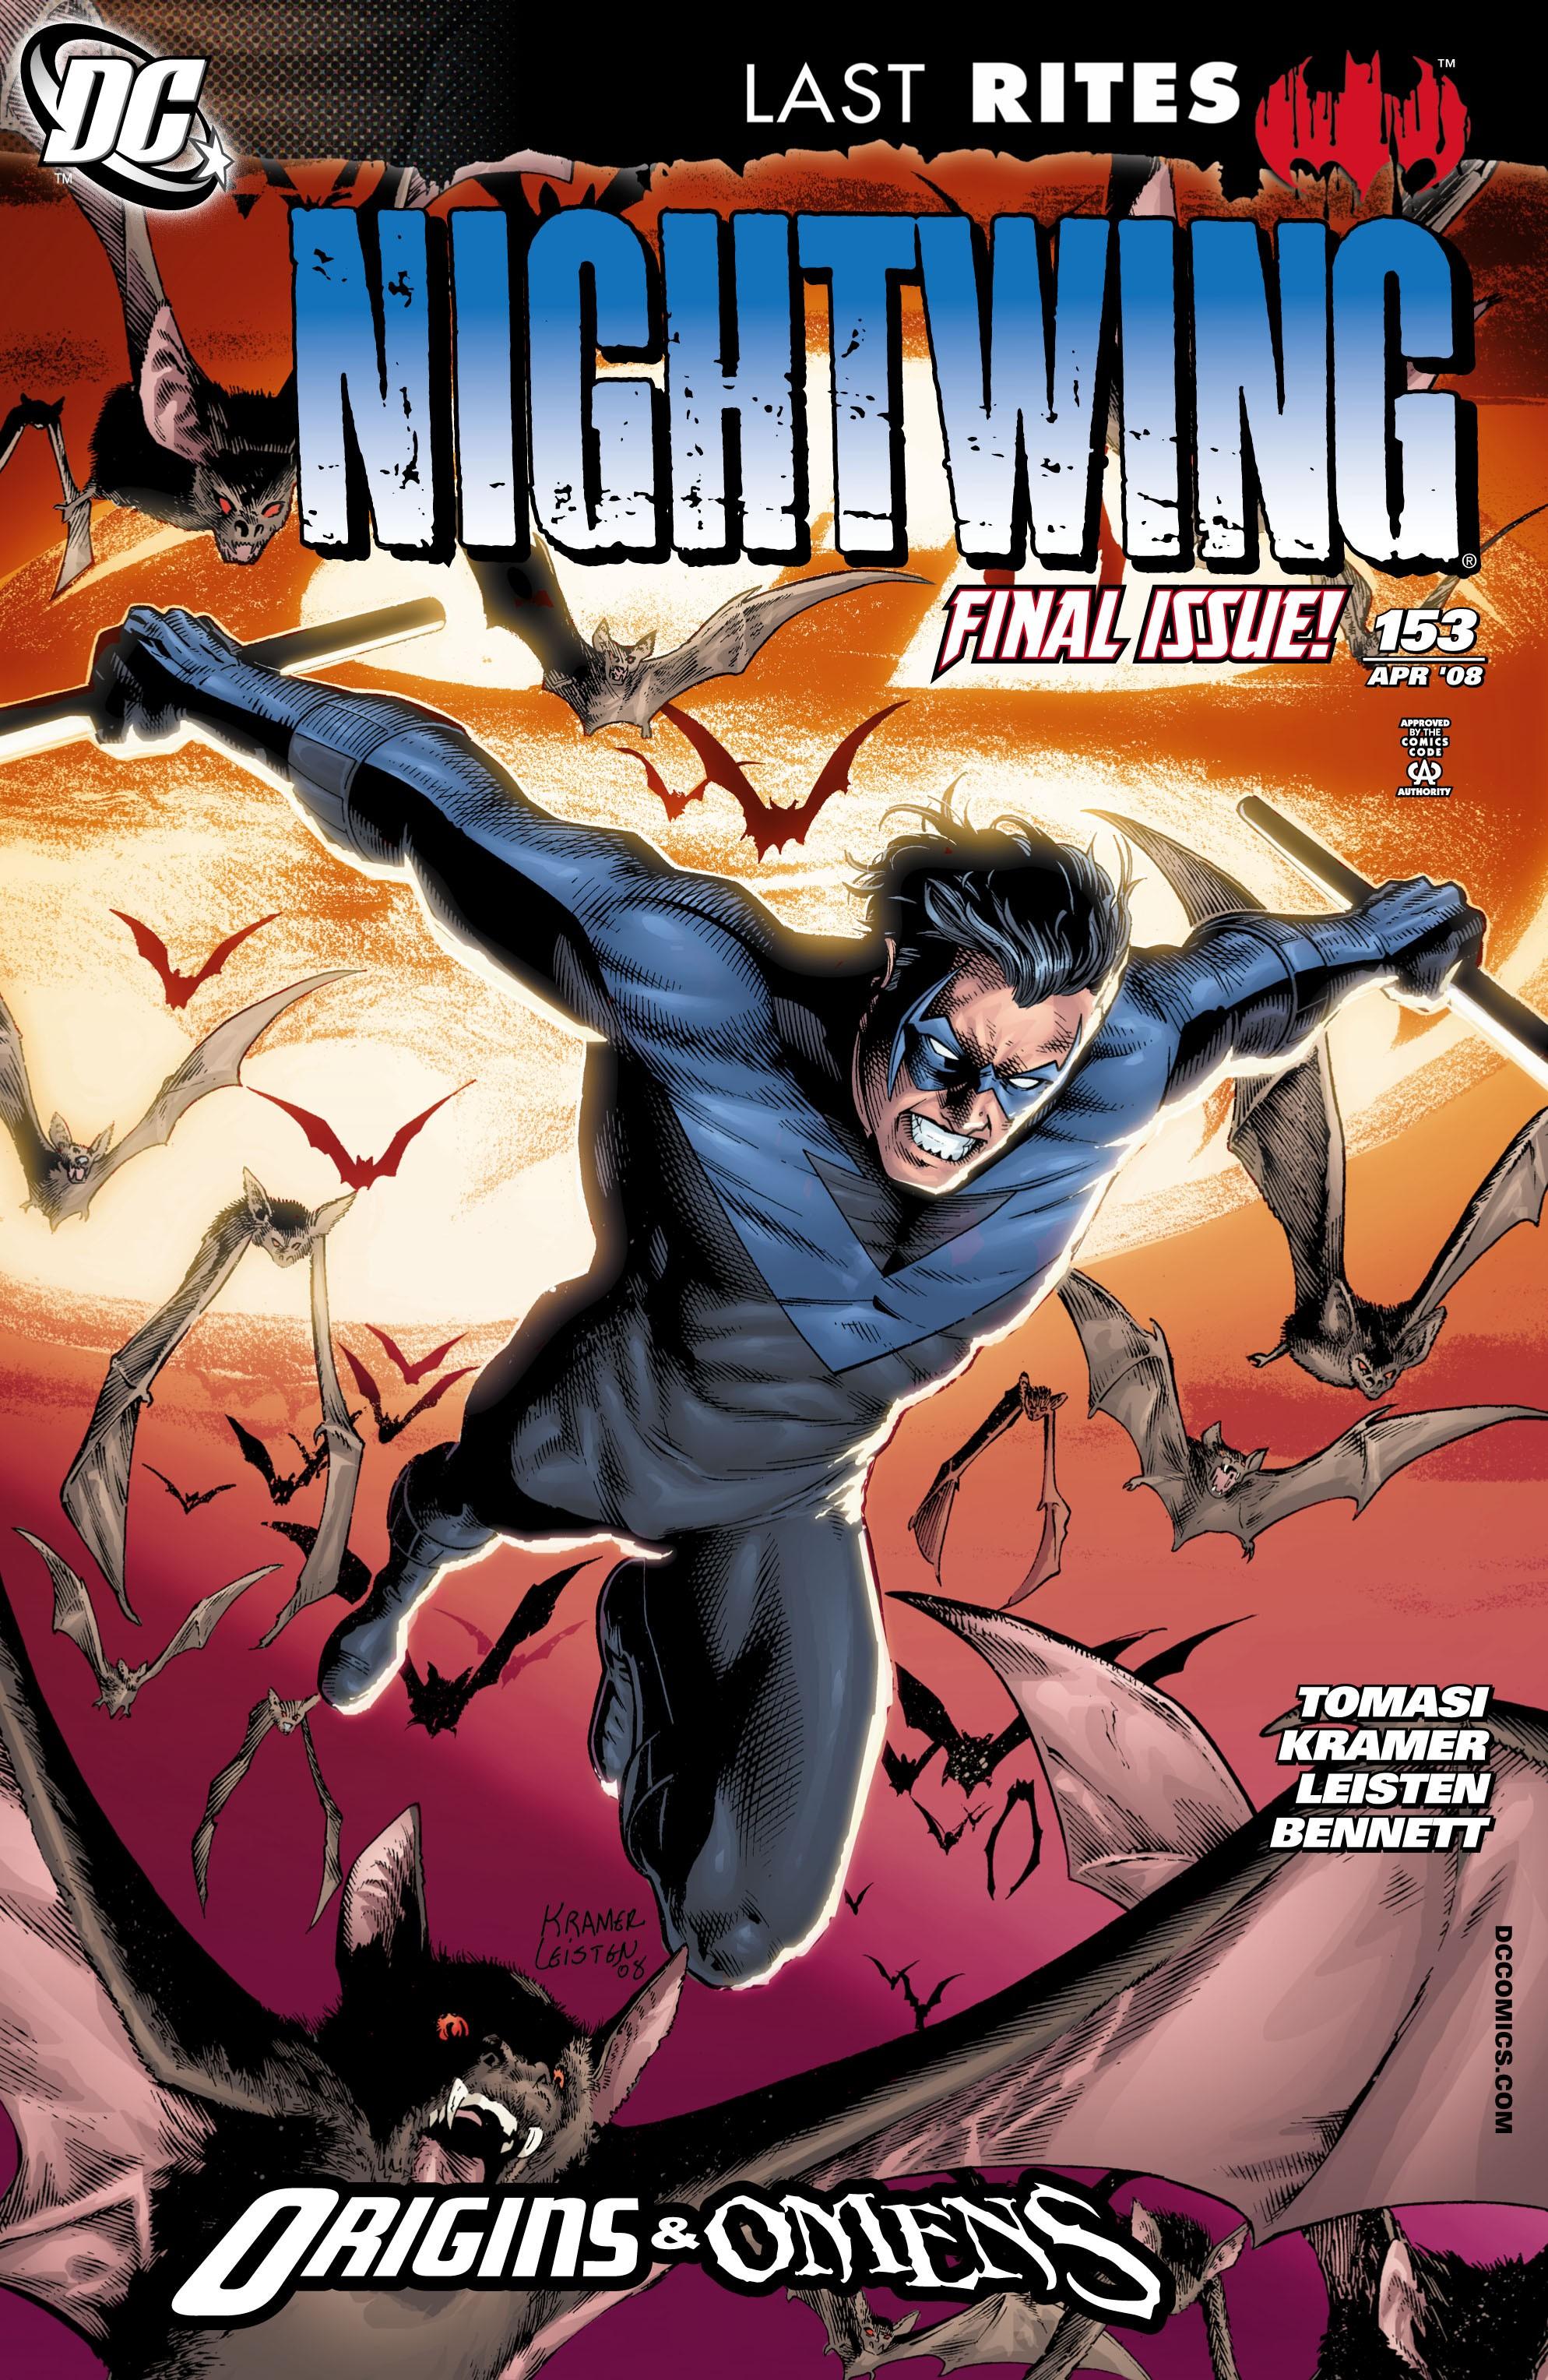 Nightwing (1996) chap 153 pic 1